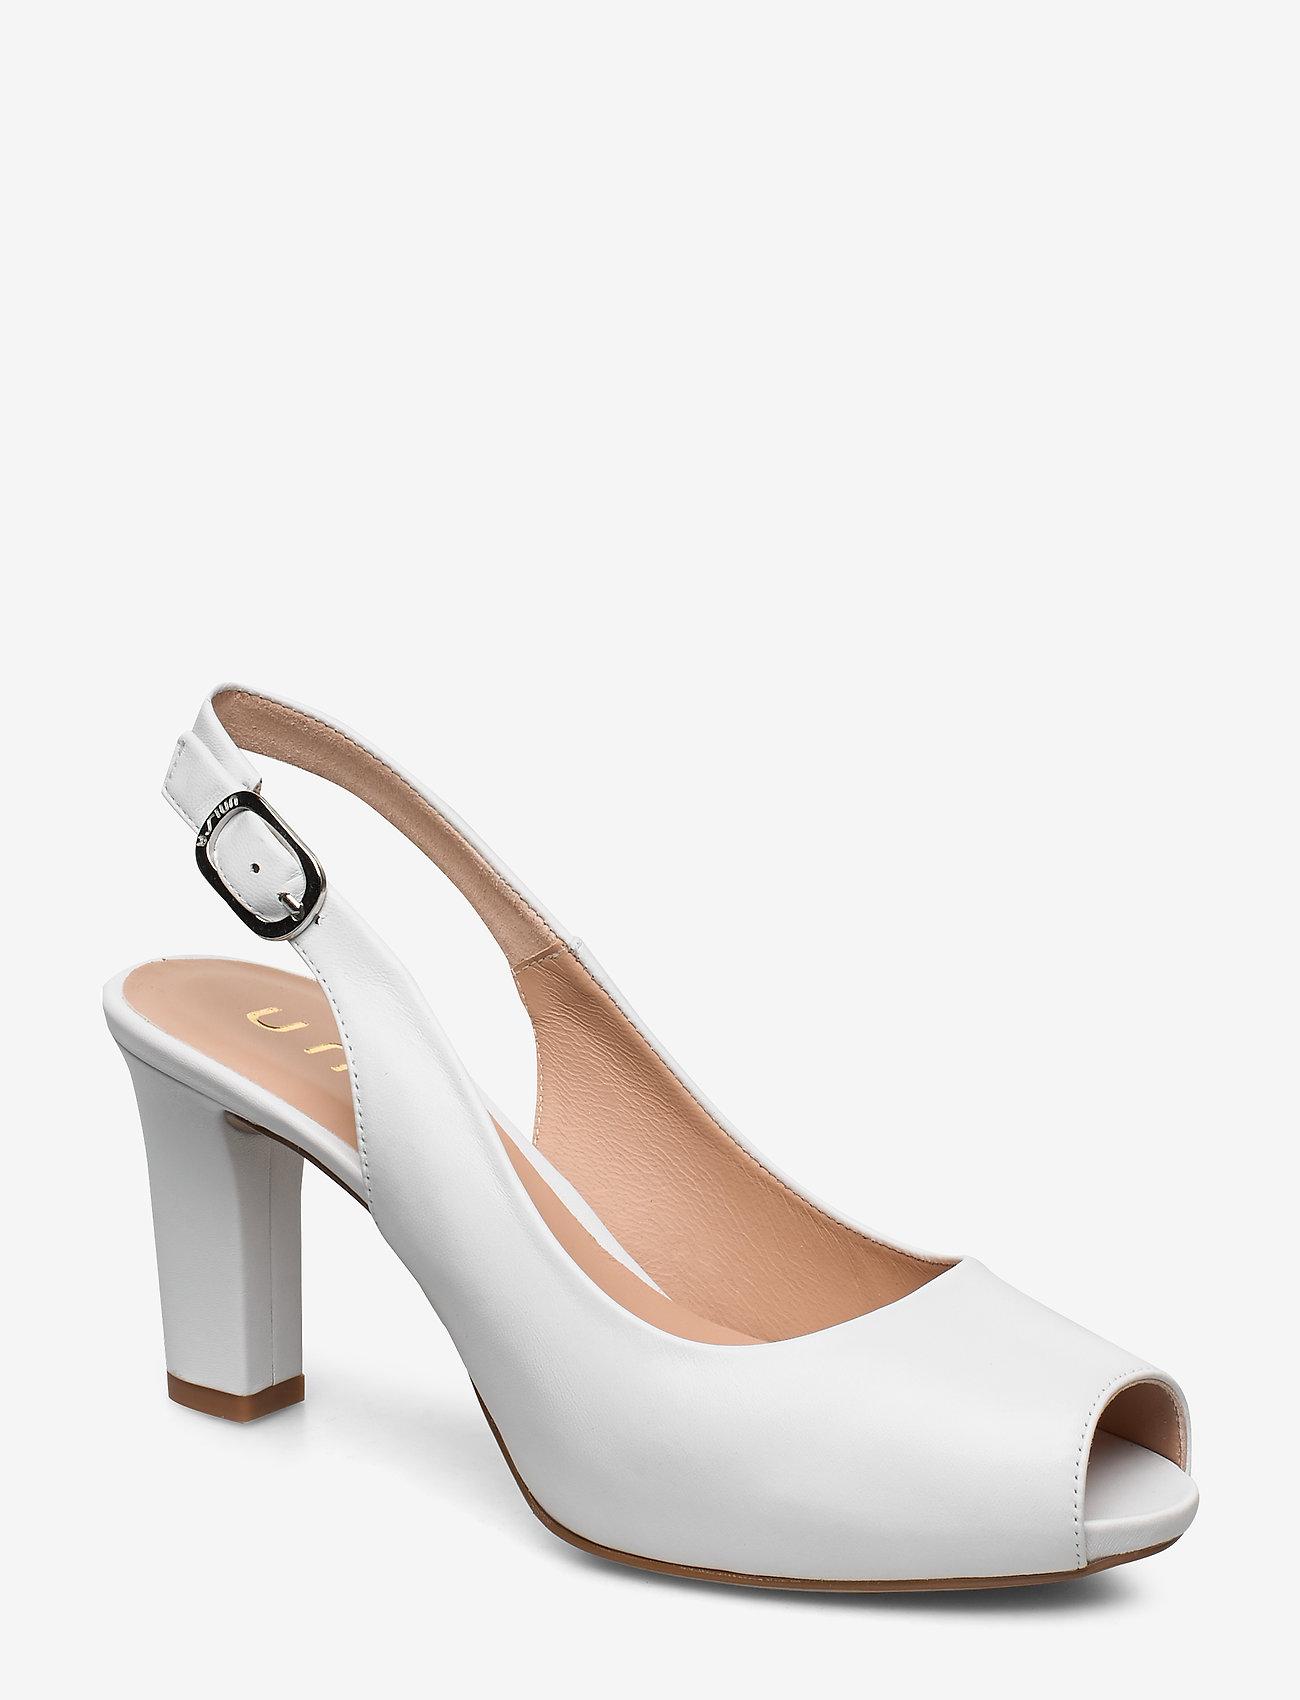 UNISA - NICKA_CLASSIC_20_NA - szpilki peep toe - white - 0